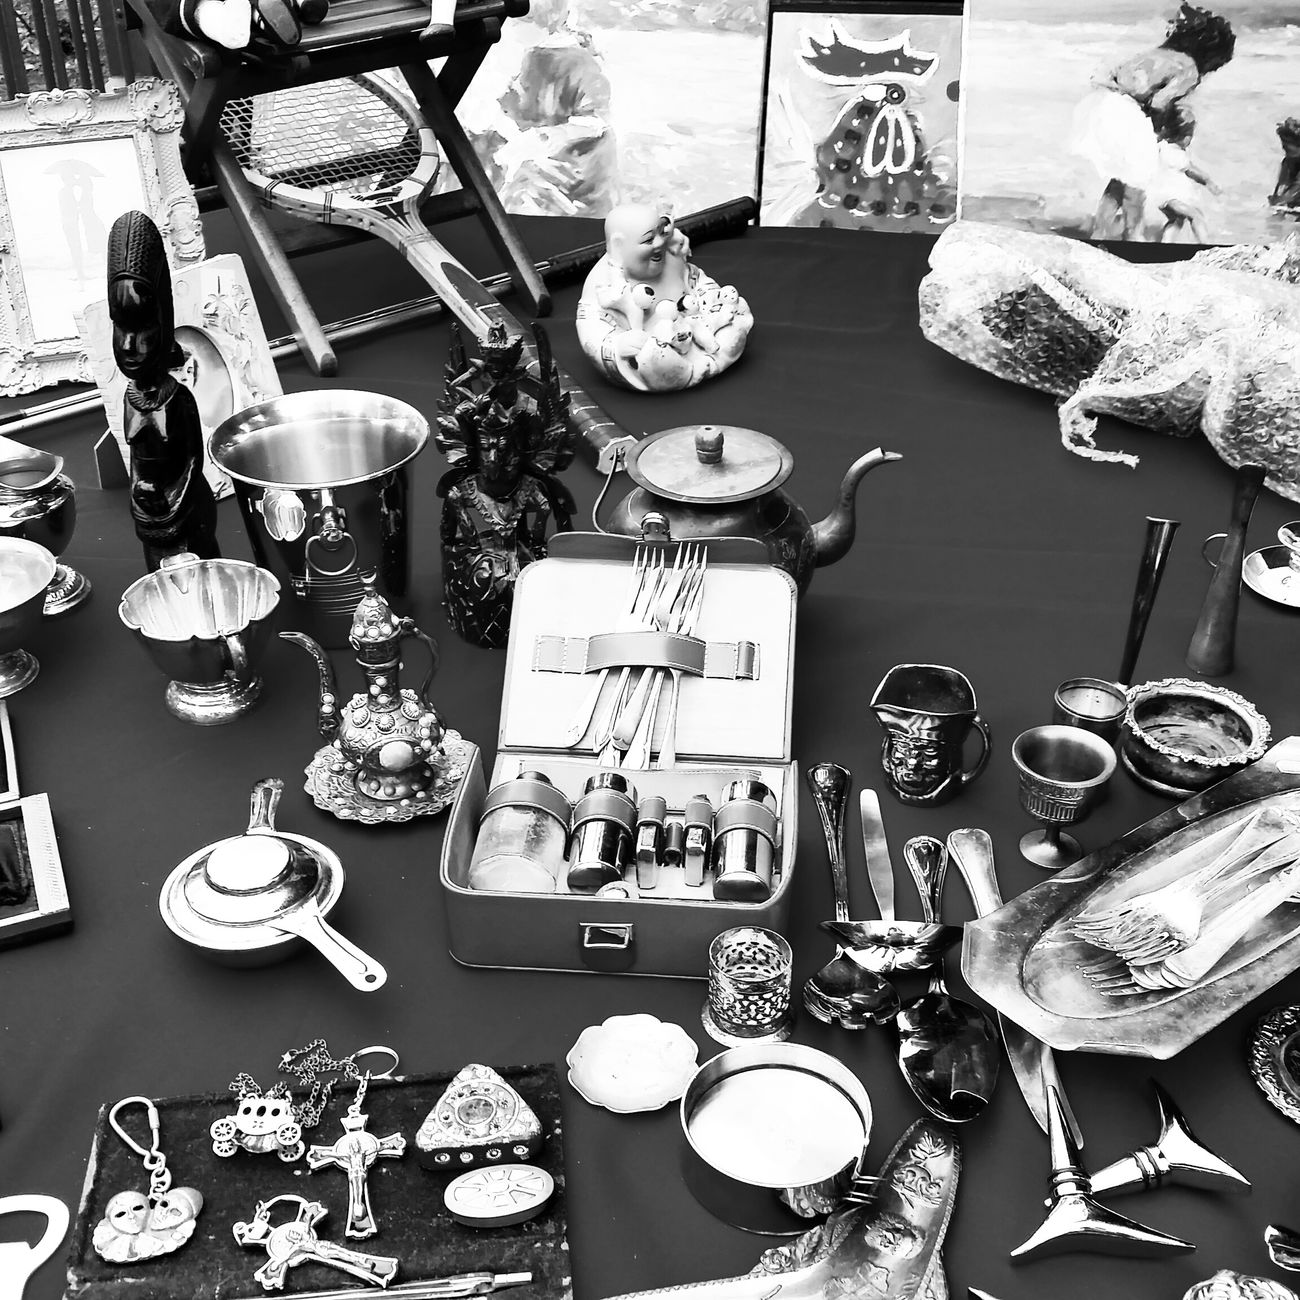 Feria d e antigüedades, antigüedades Santiago De Chile